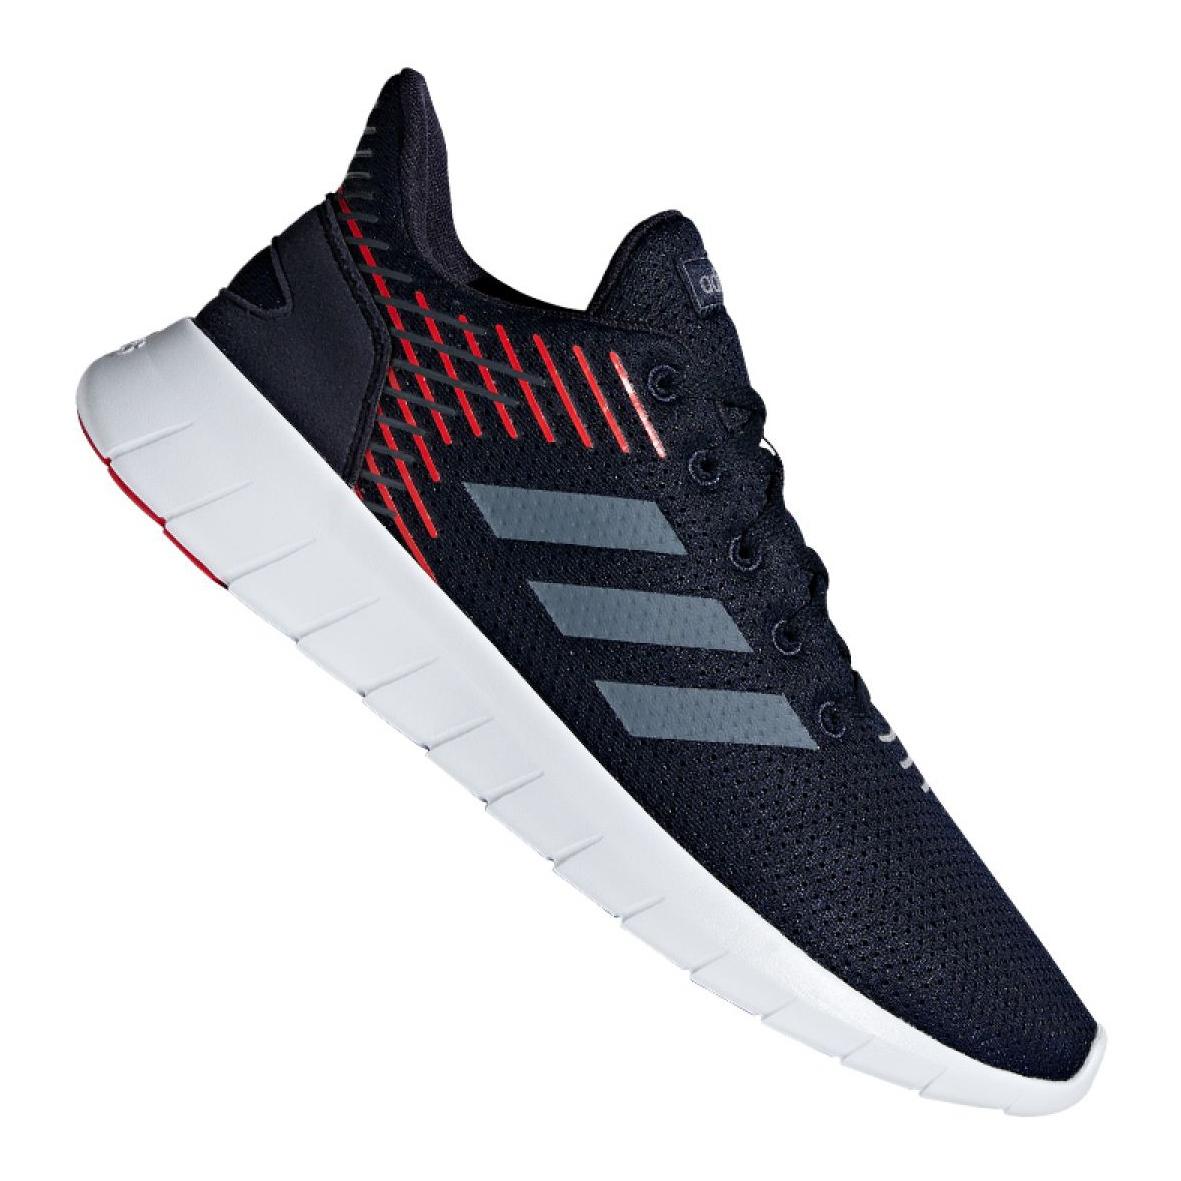 Détails sur Chaussures de running adidas Asweerun M F36334 multicolore